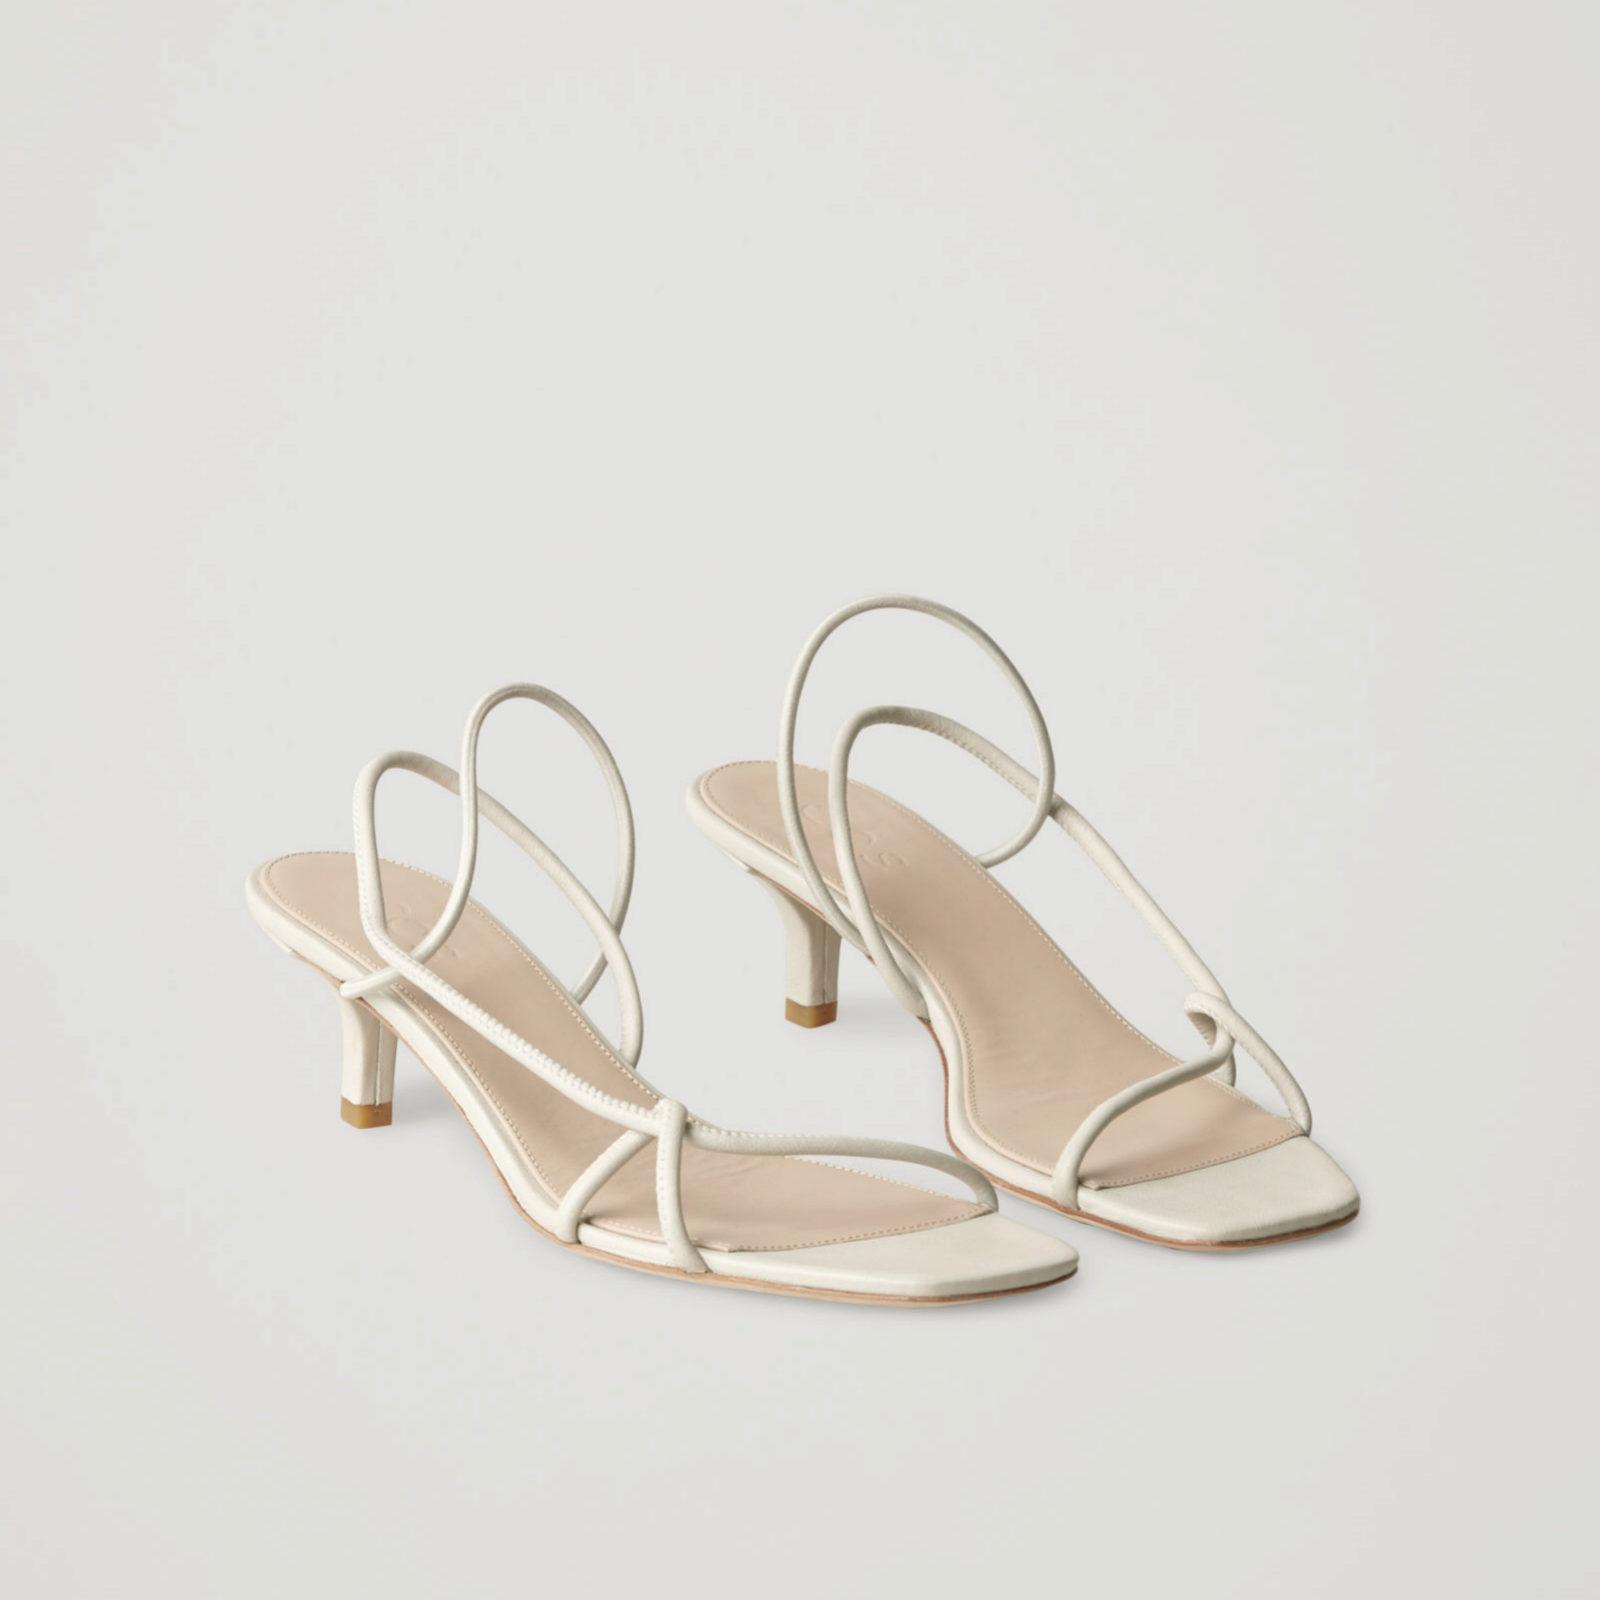 Sandalias de estilo minimal en blanco de COS